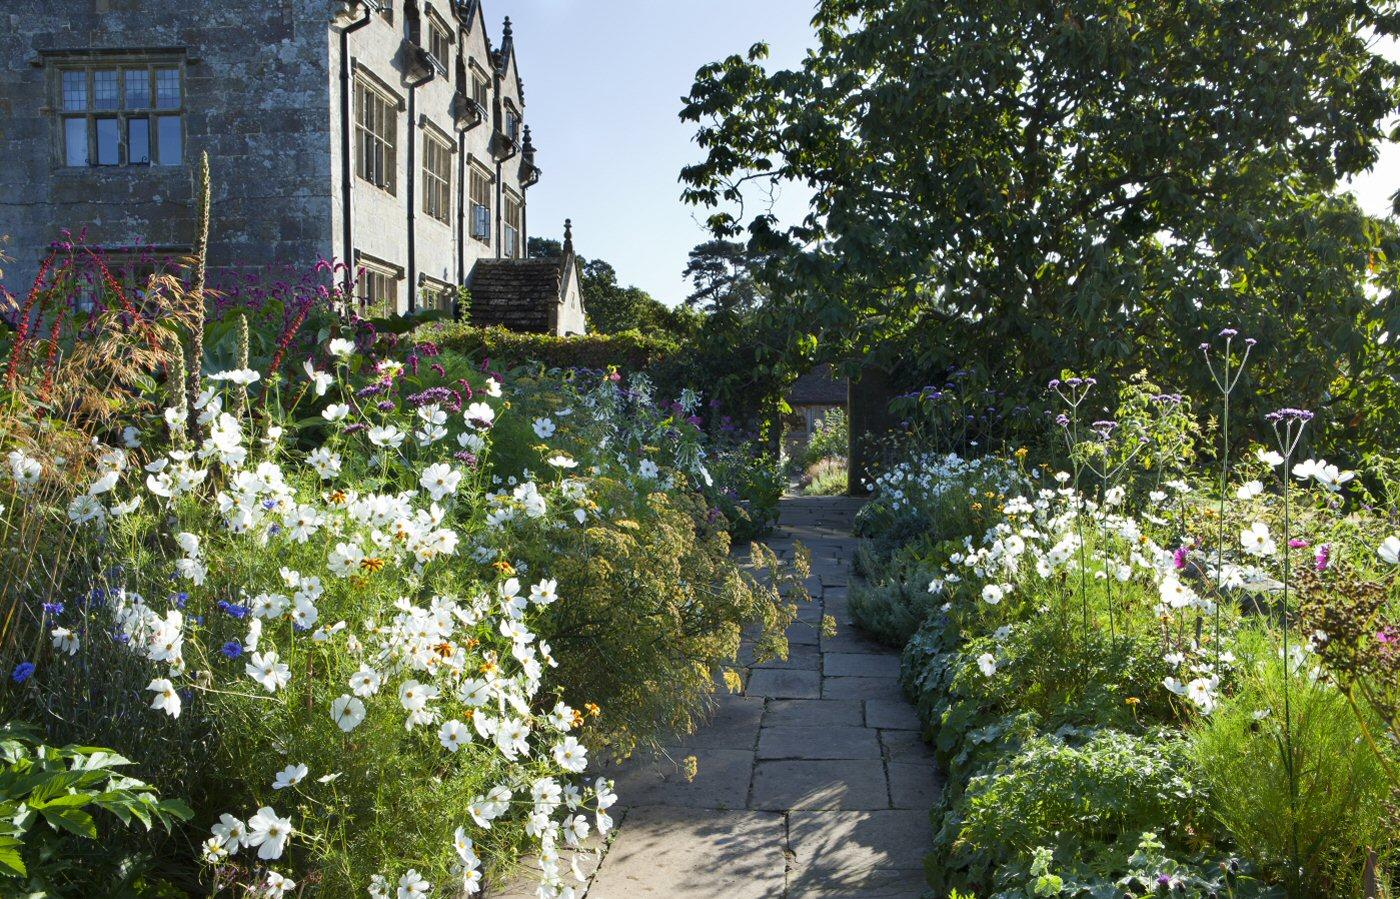 Gardens at Gravetye Manor